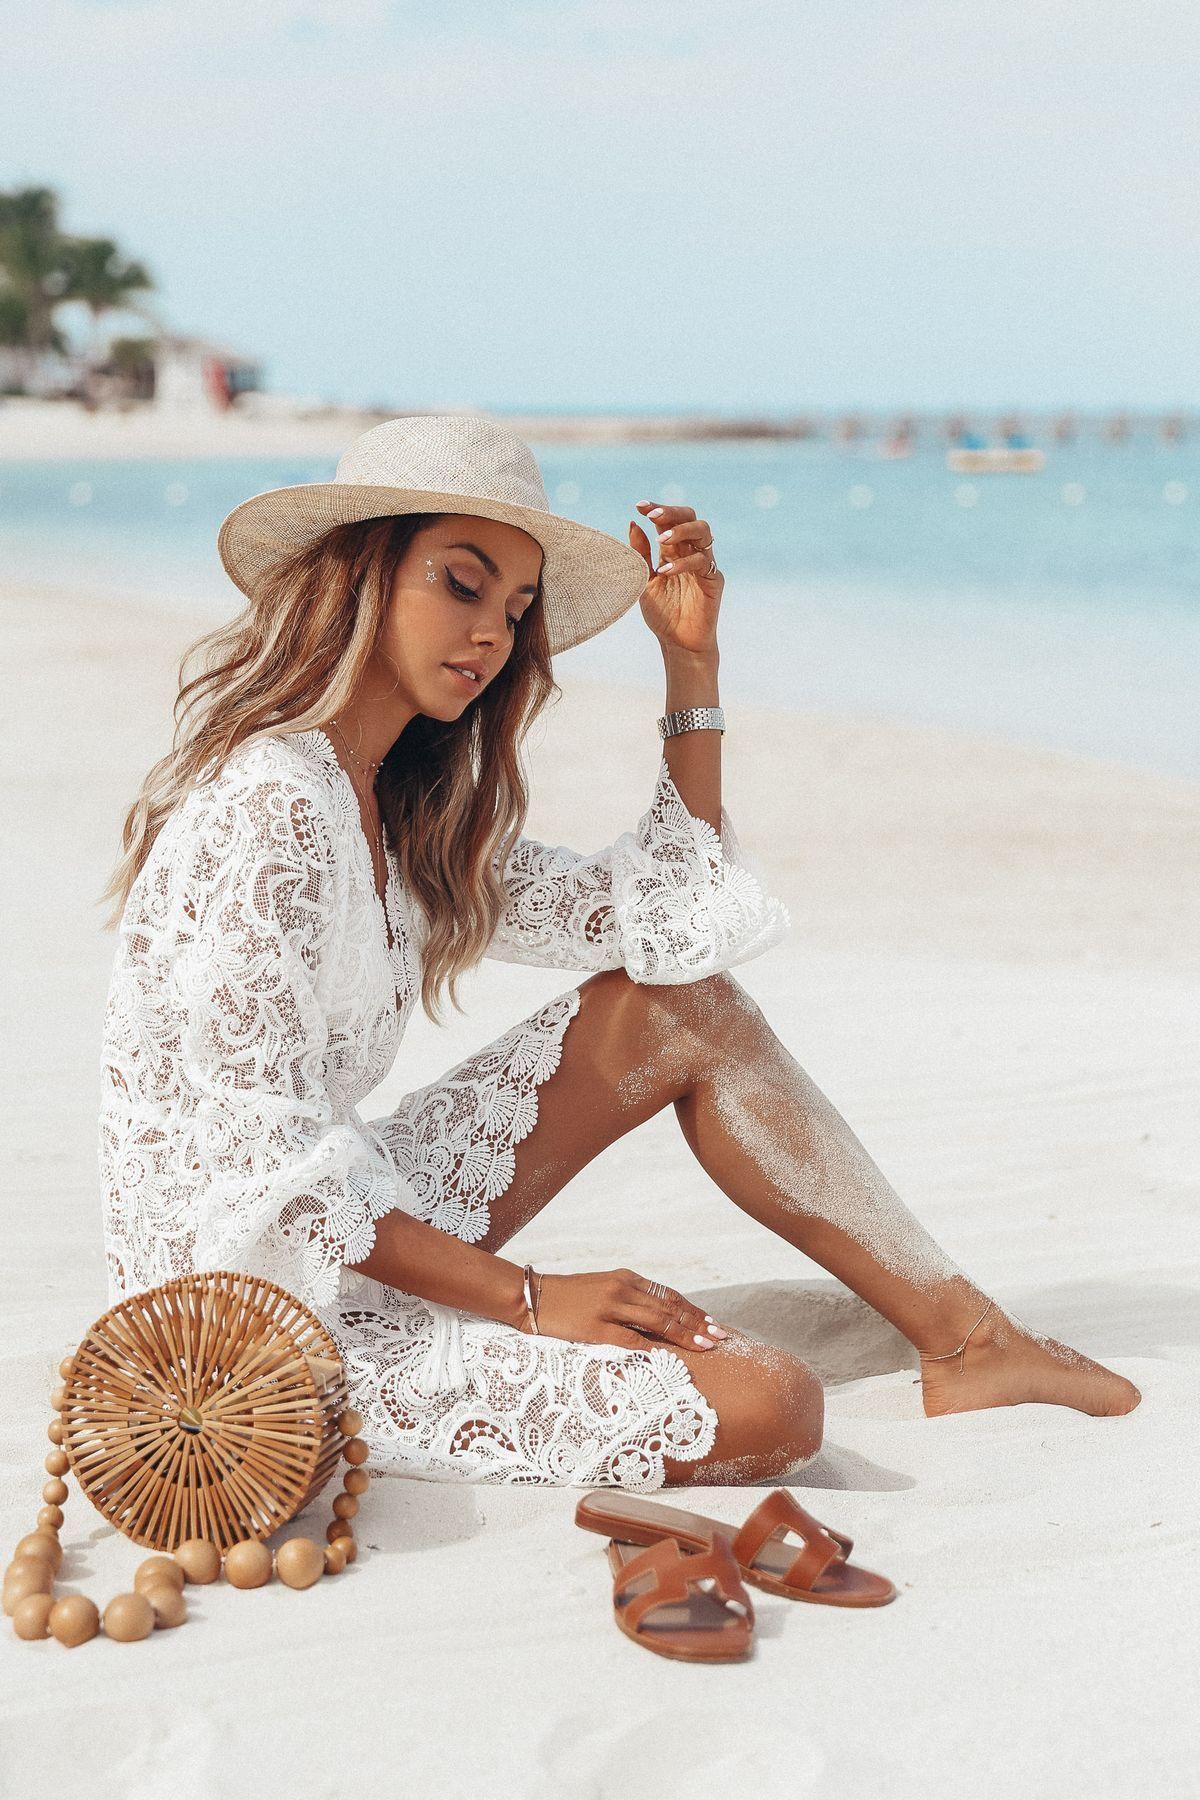 Wɦiʈye Summyeɾ Brɛɛzɛ Beach Dresses Summer Lace Beach Wedding Dress Beach Coverup Dress